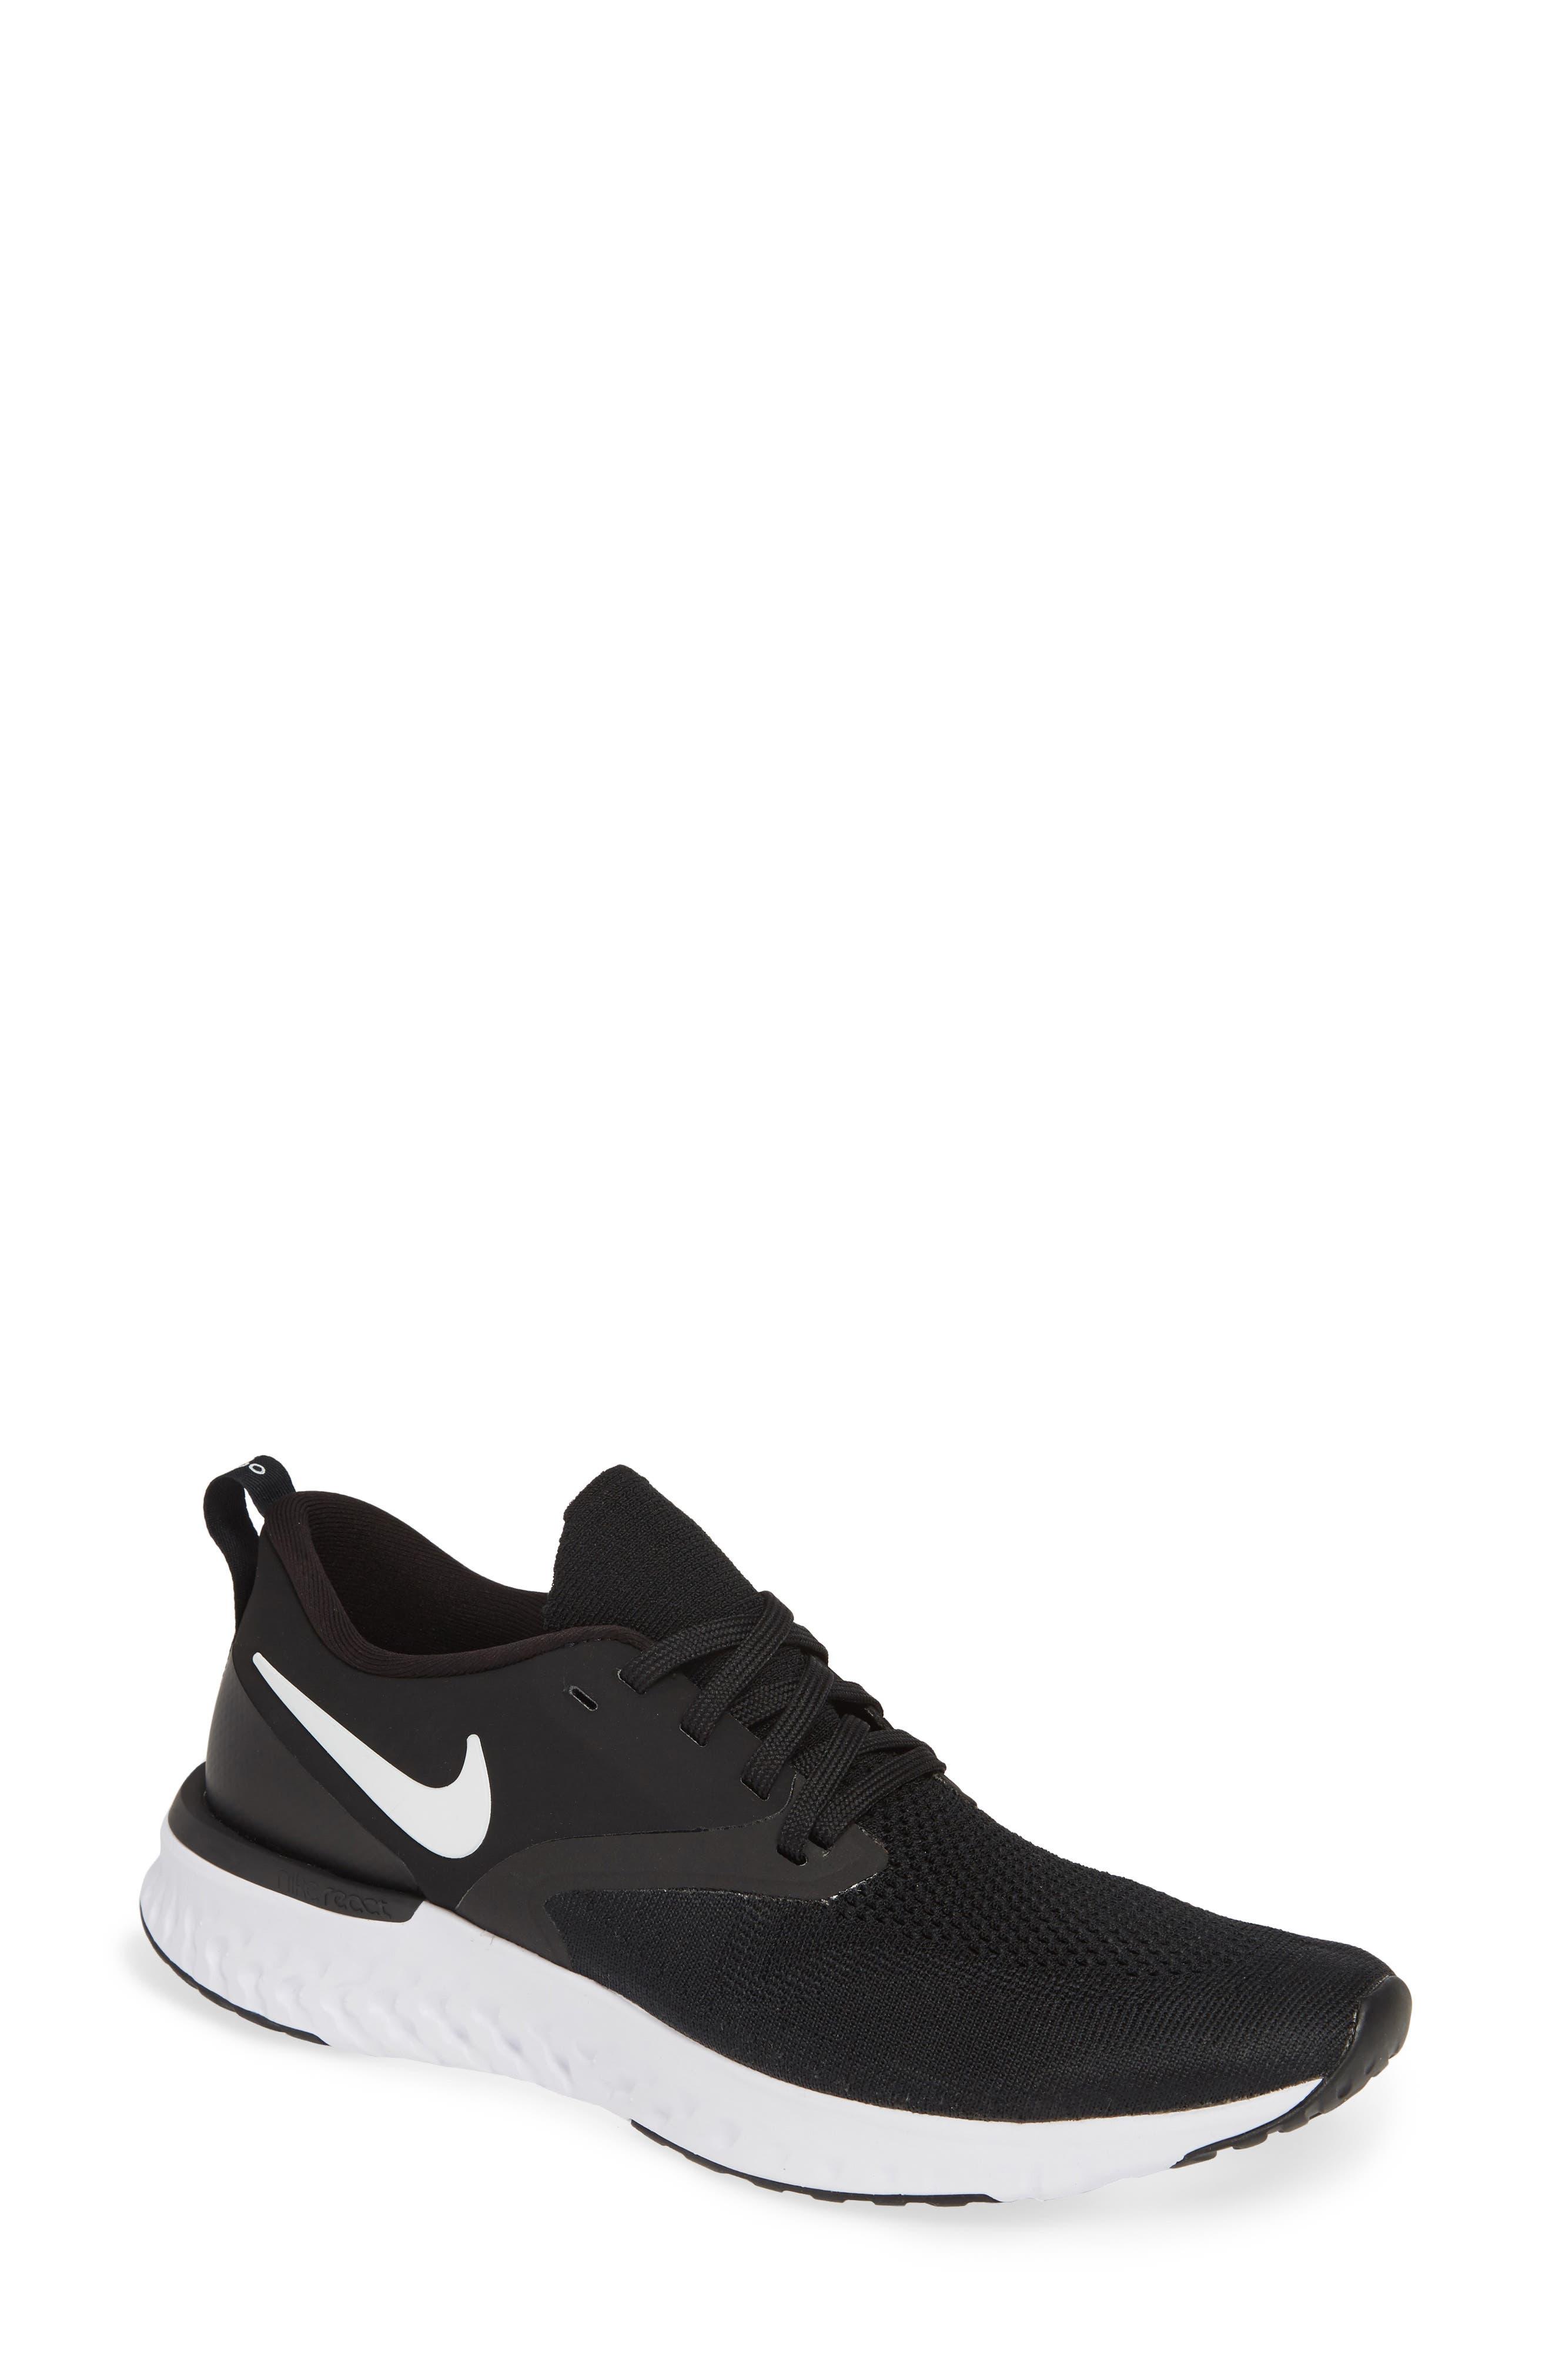 cf0bab162cd98 Women s Nike Shoes Sale